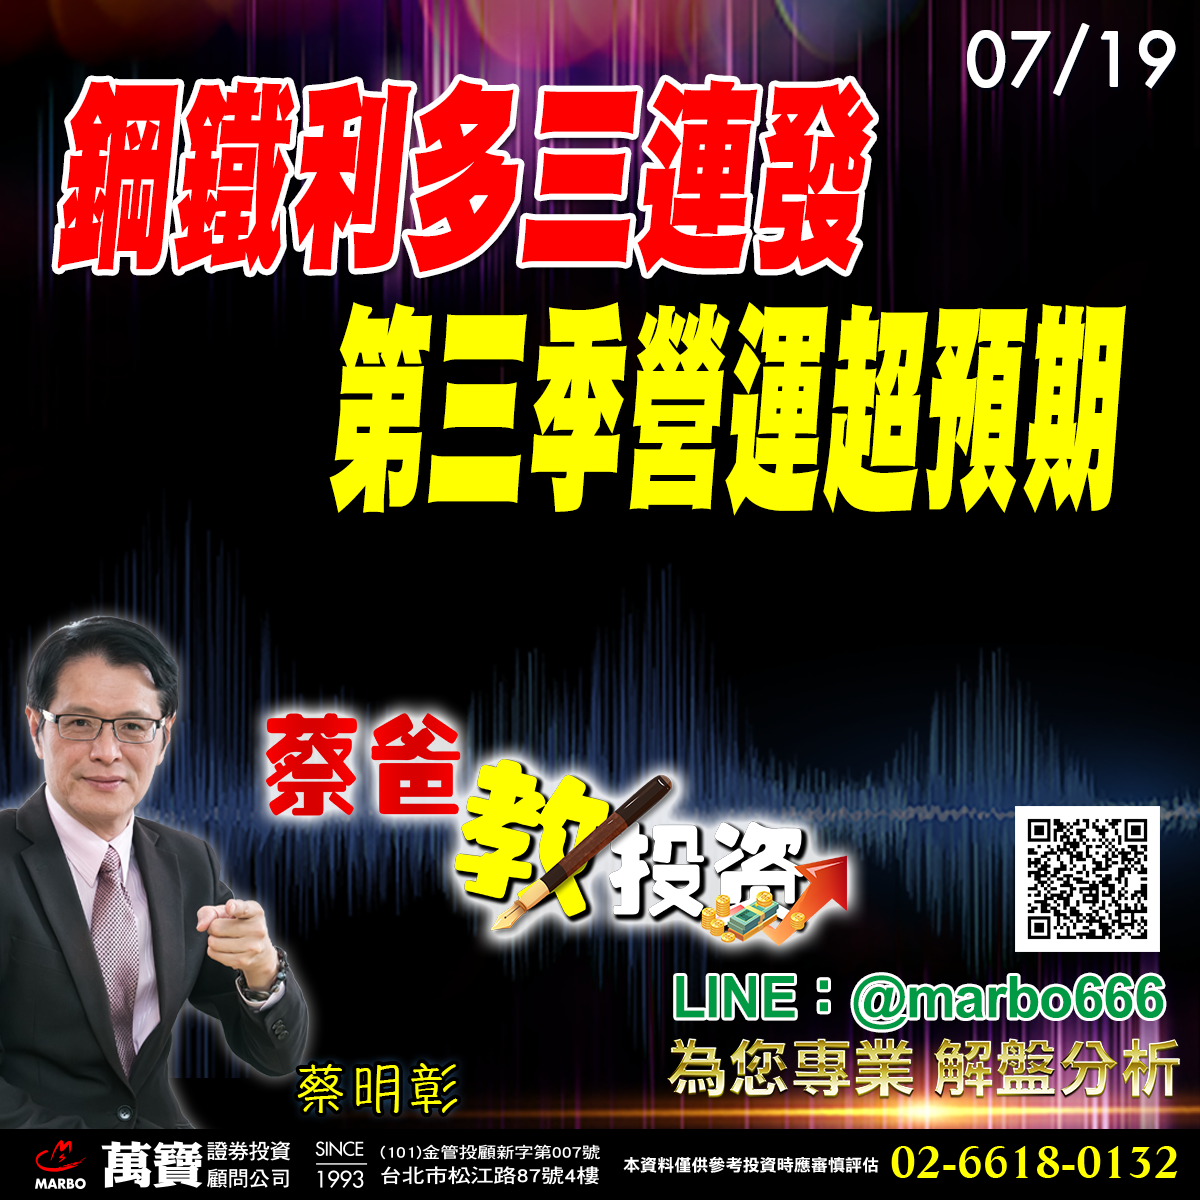 EP97 鋼鐵利多三連發,第三季營運超預期_蔡明彰_2021_07_19